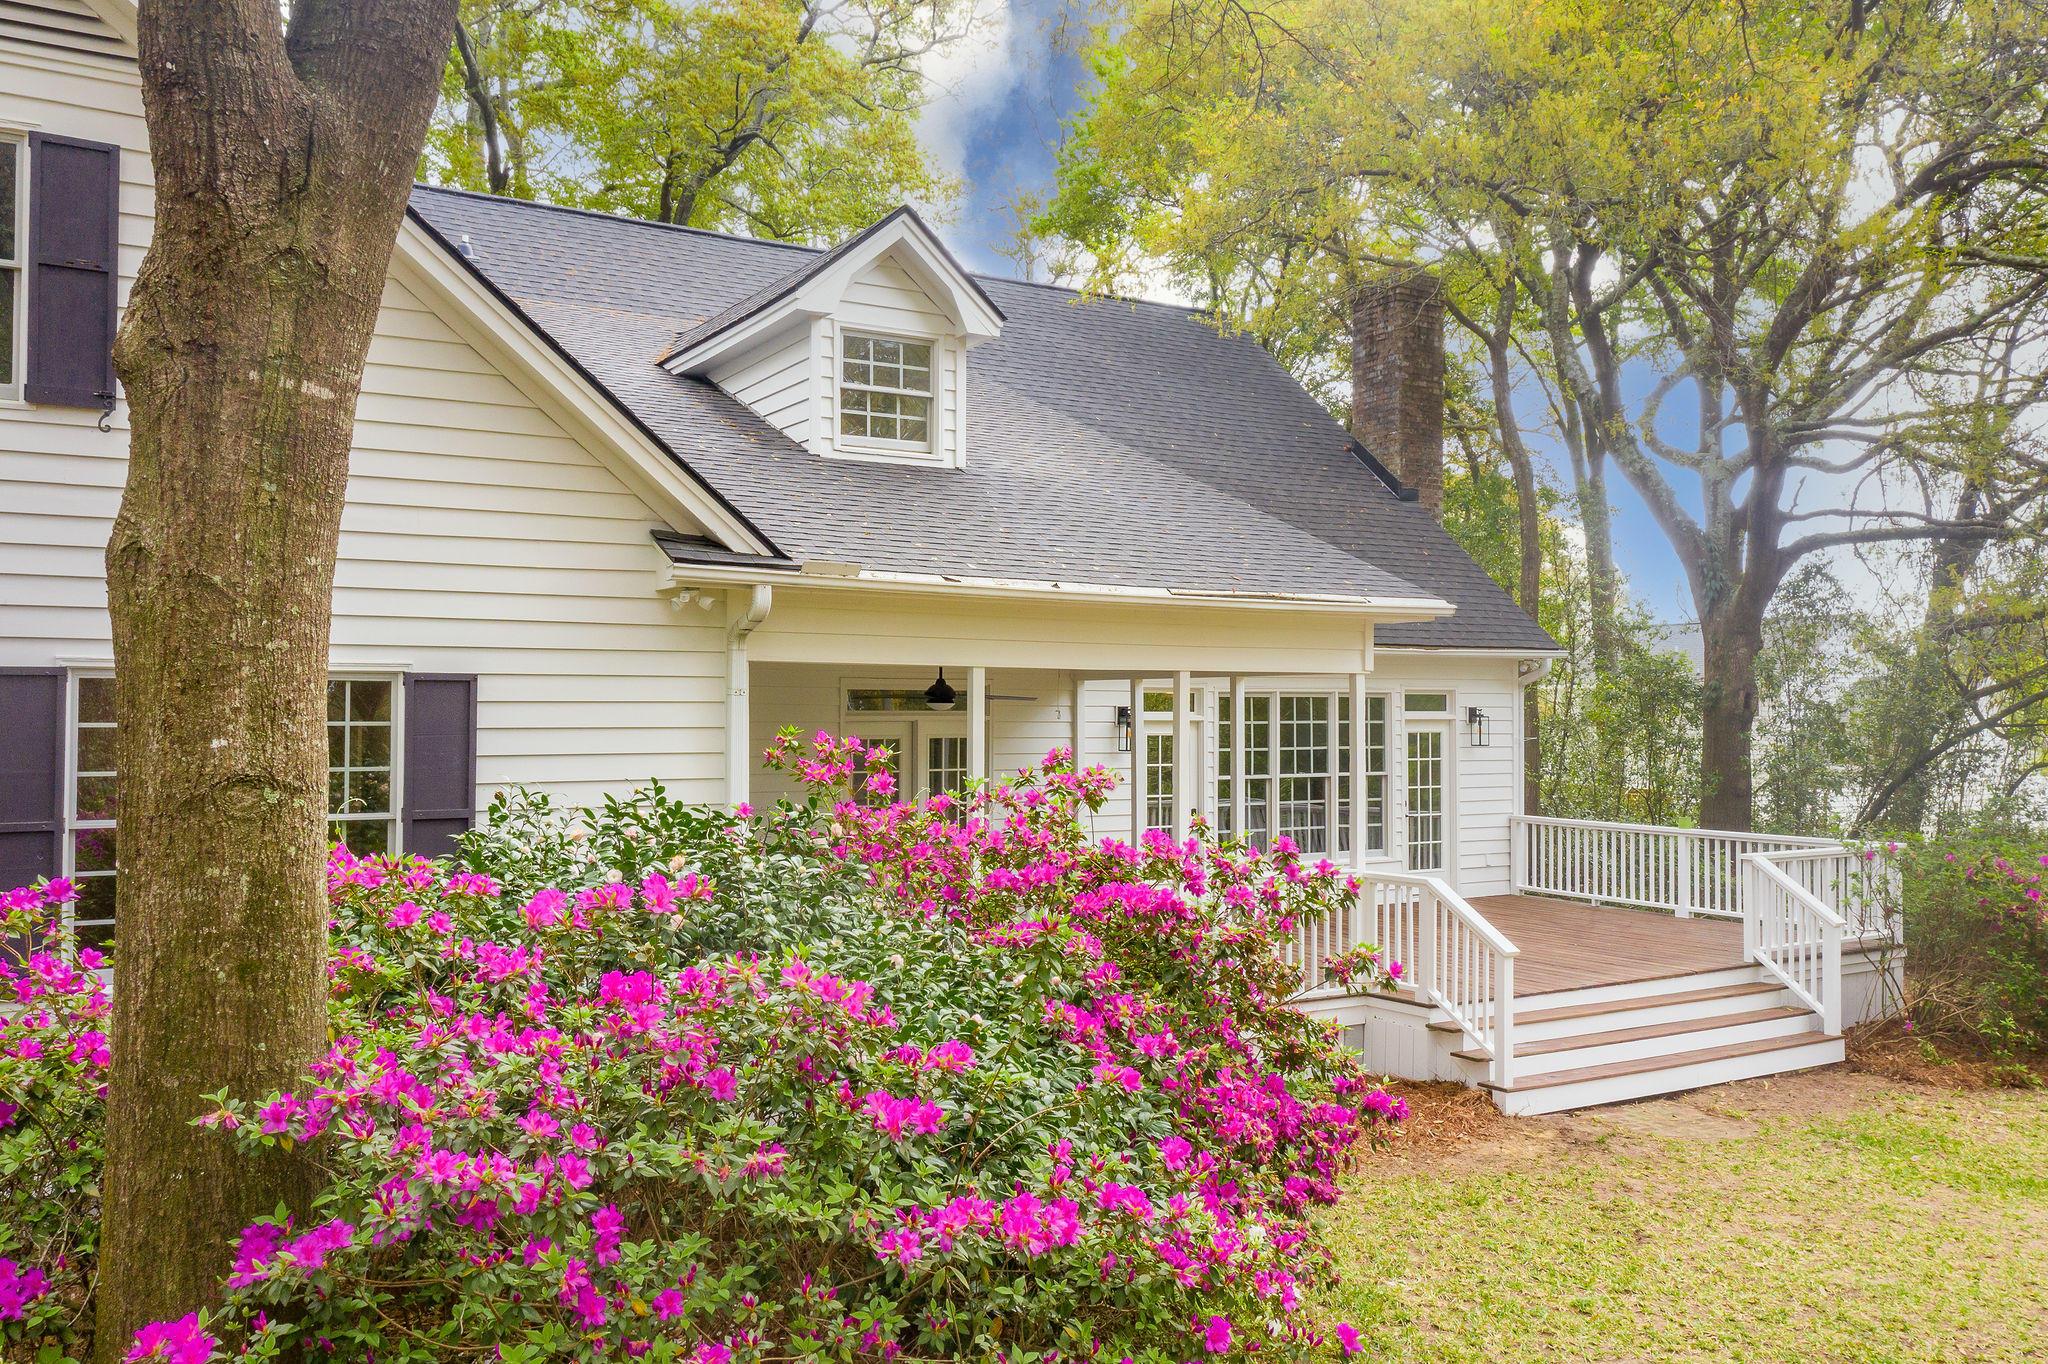 Old Mt Pleasant Homes For Sale - 1417 Edwards, Mount Pleasant, SC - 39